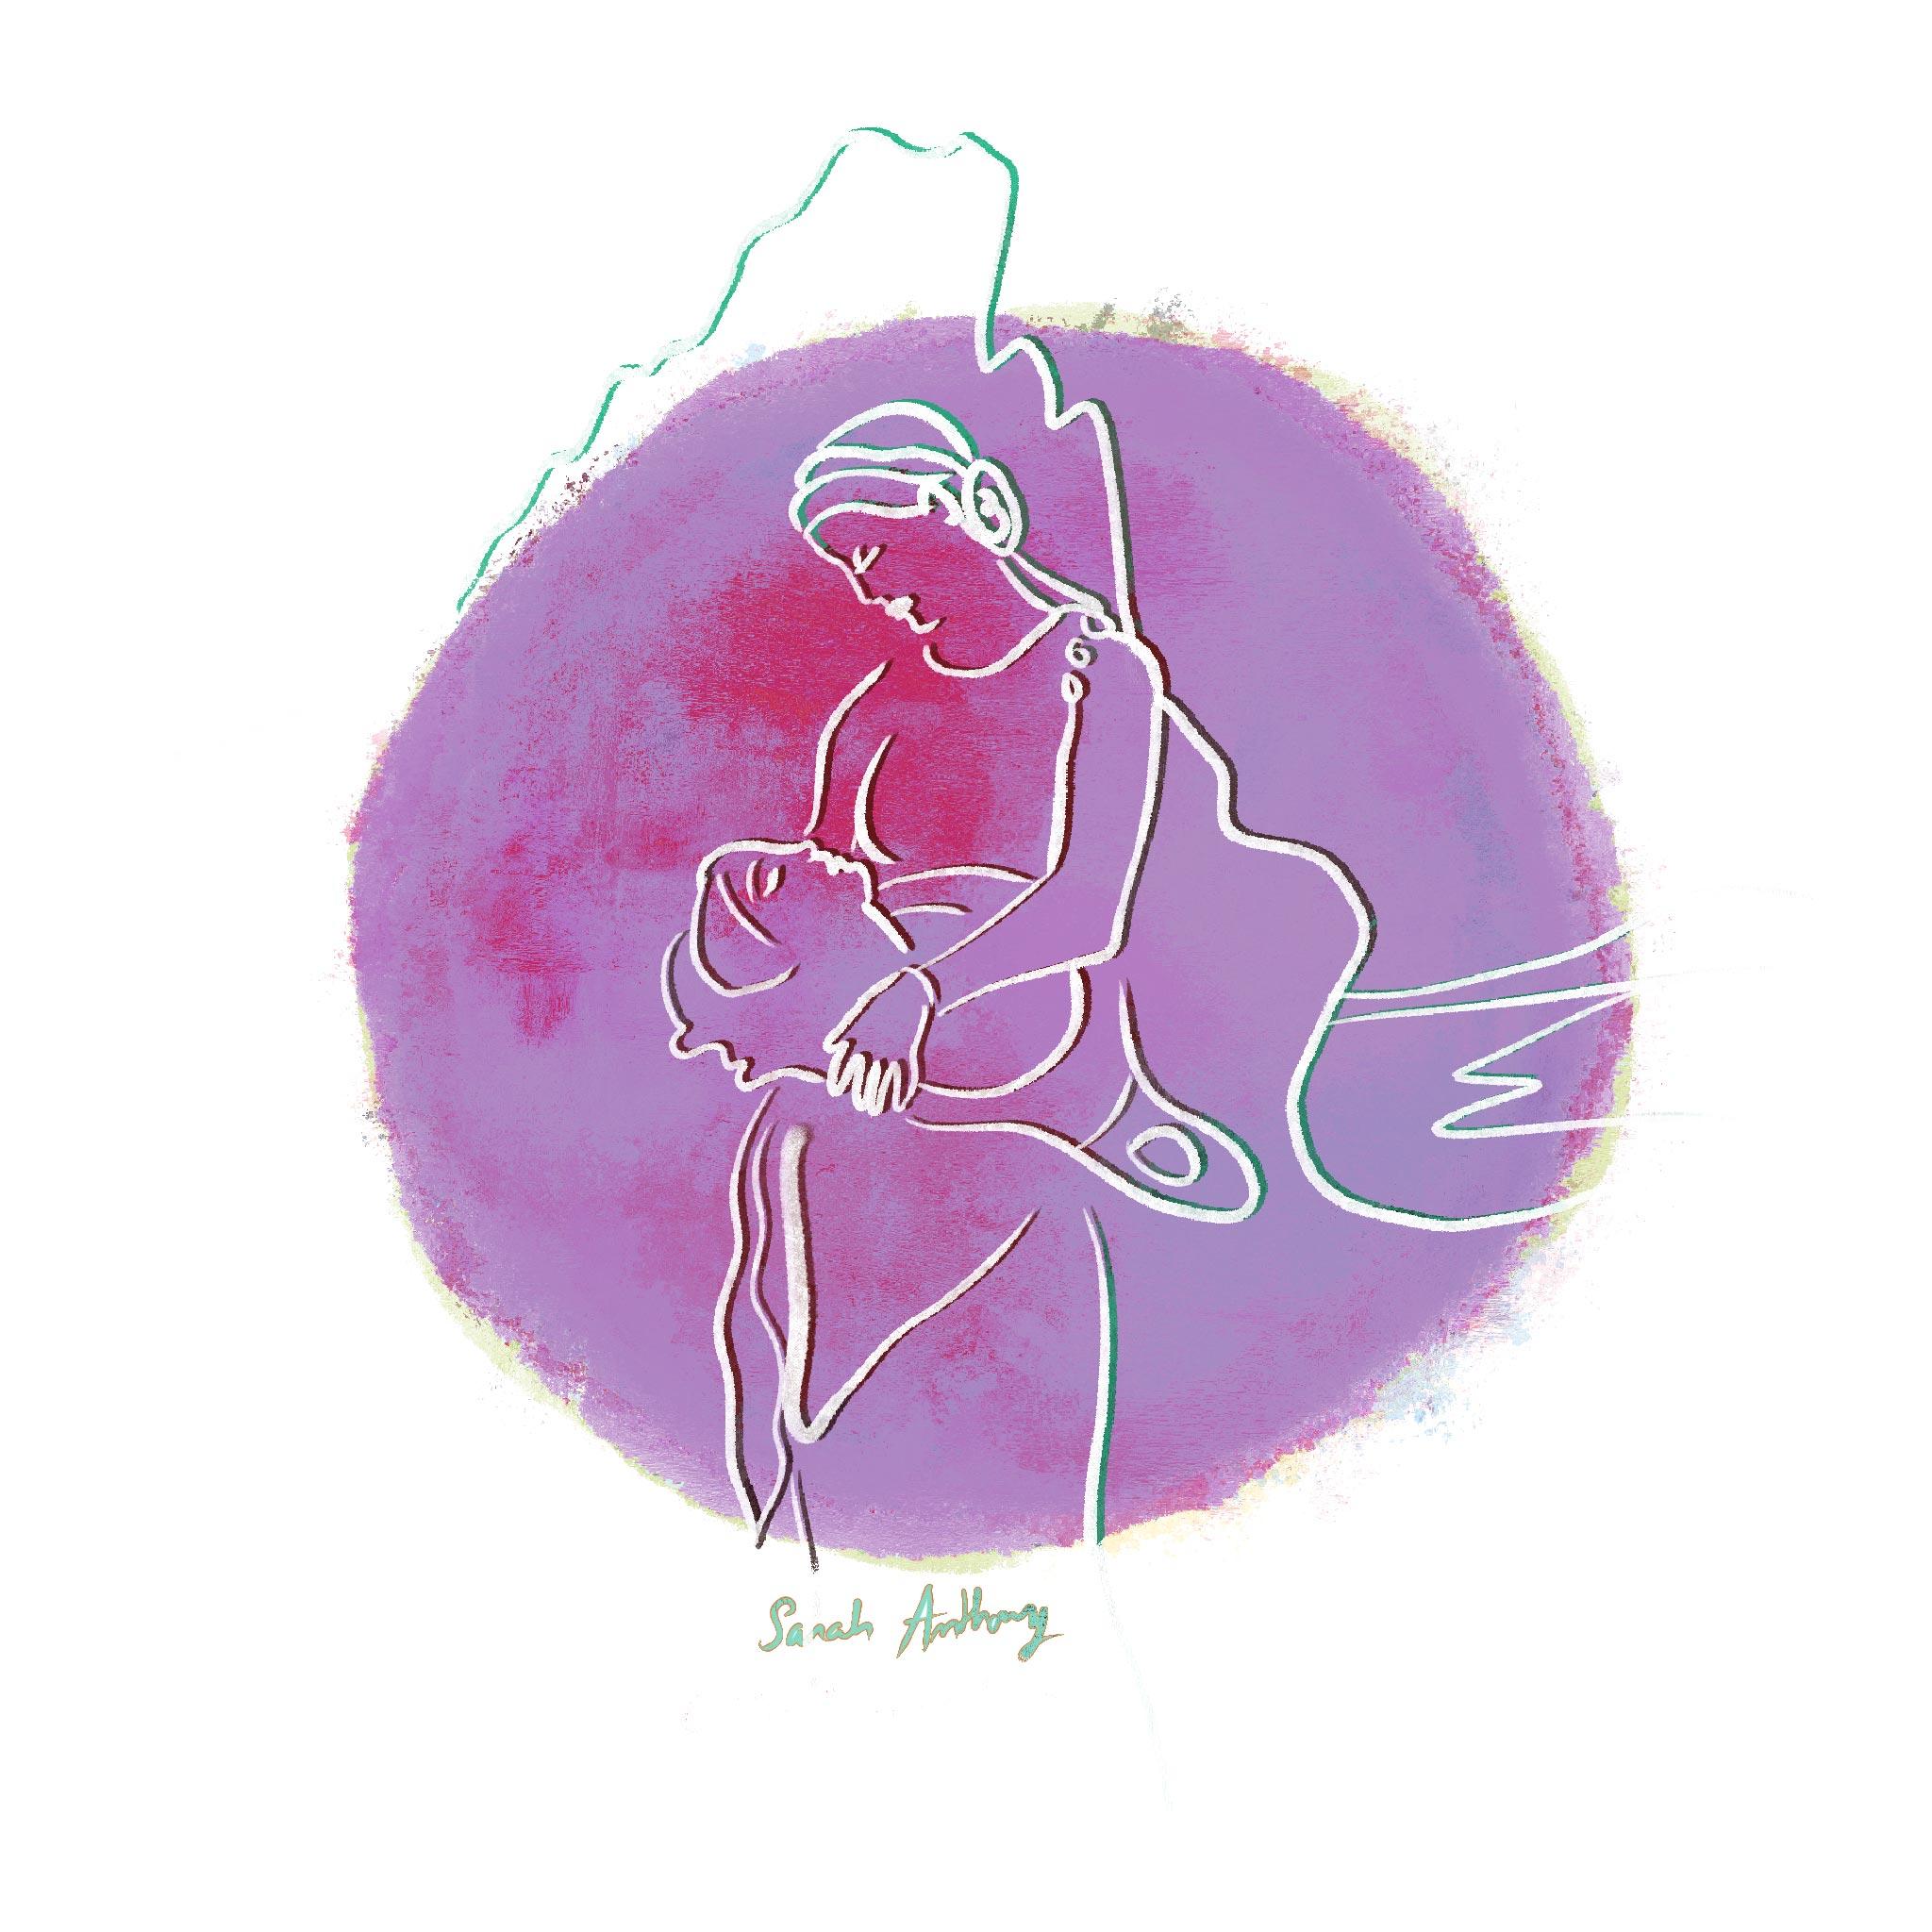 symbolisme-reduit-sarah-anthony